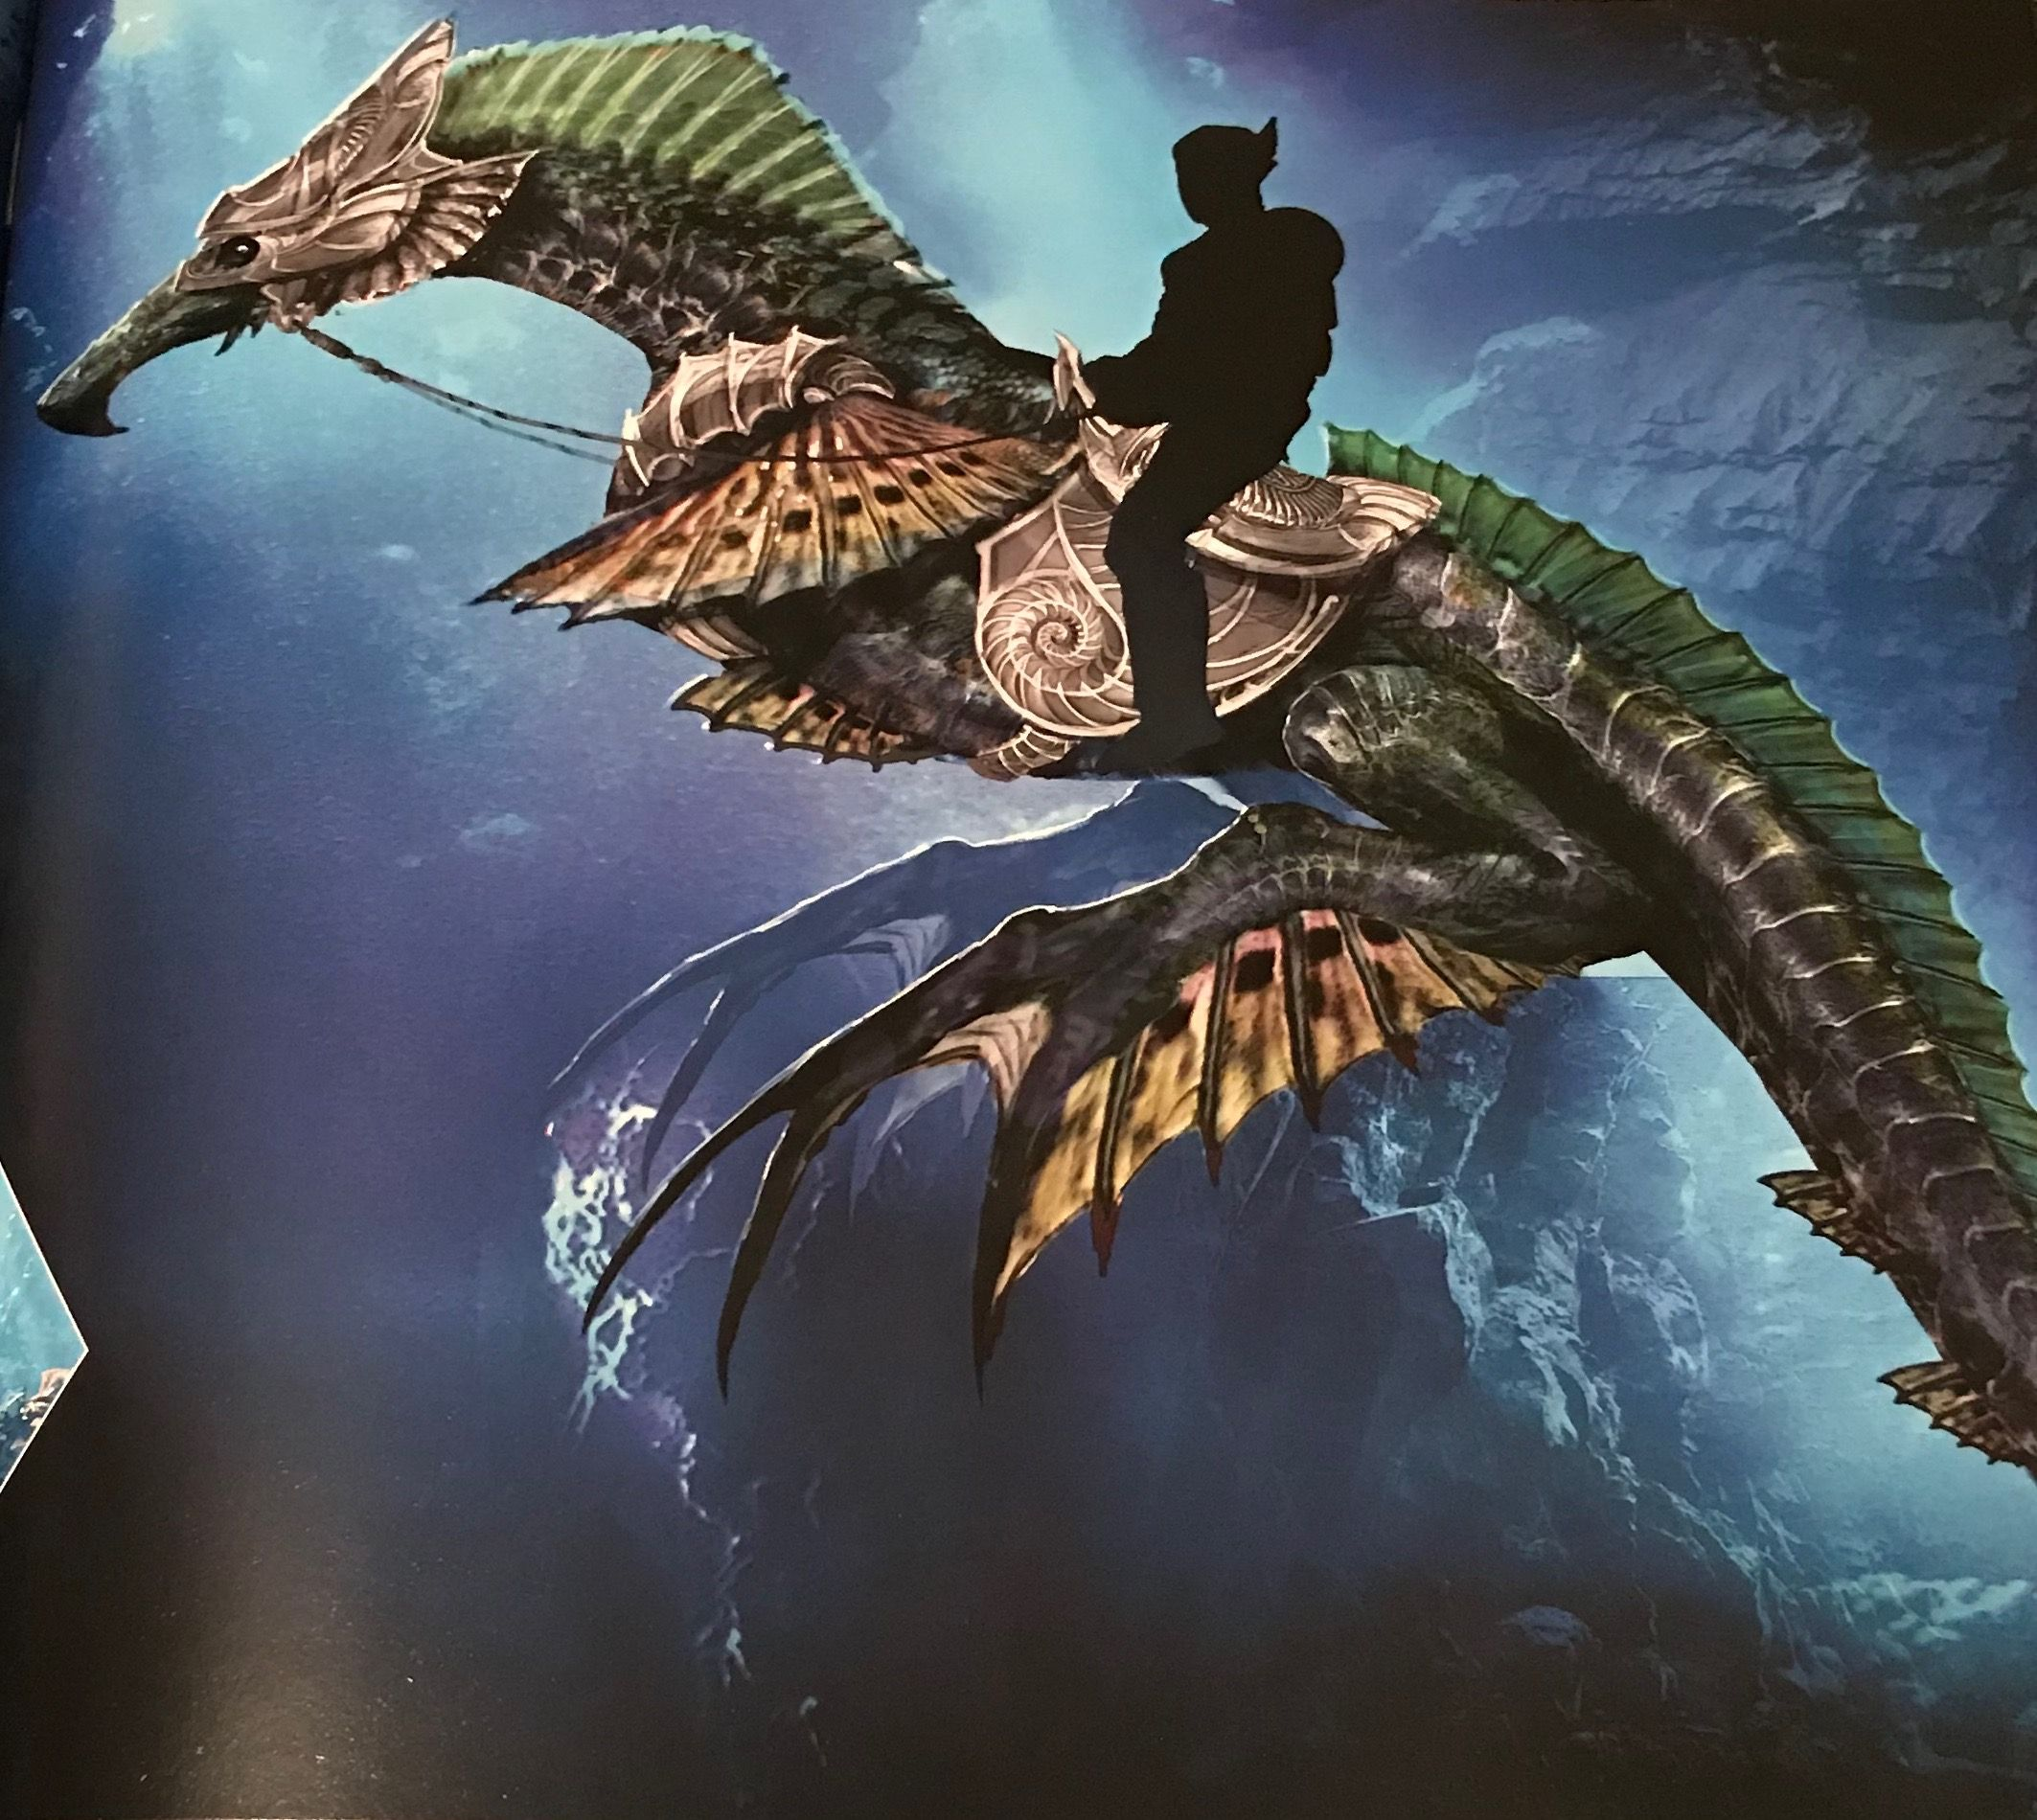 Concept Art Aquaman Movie Kraken